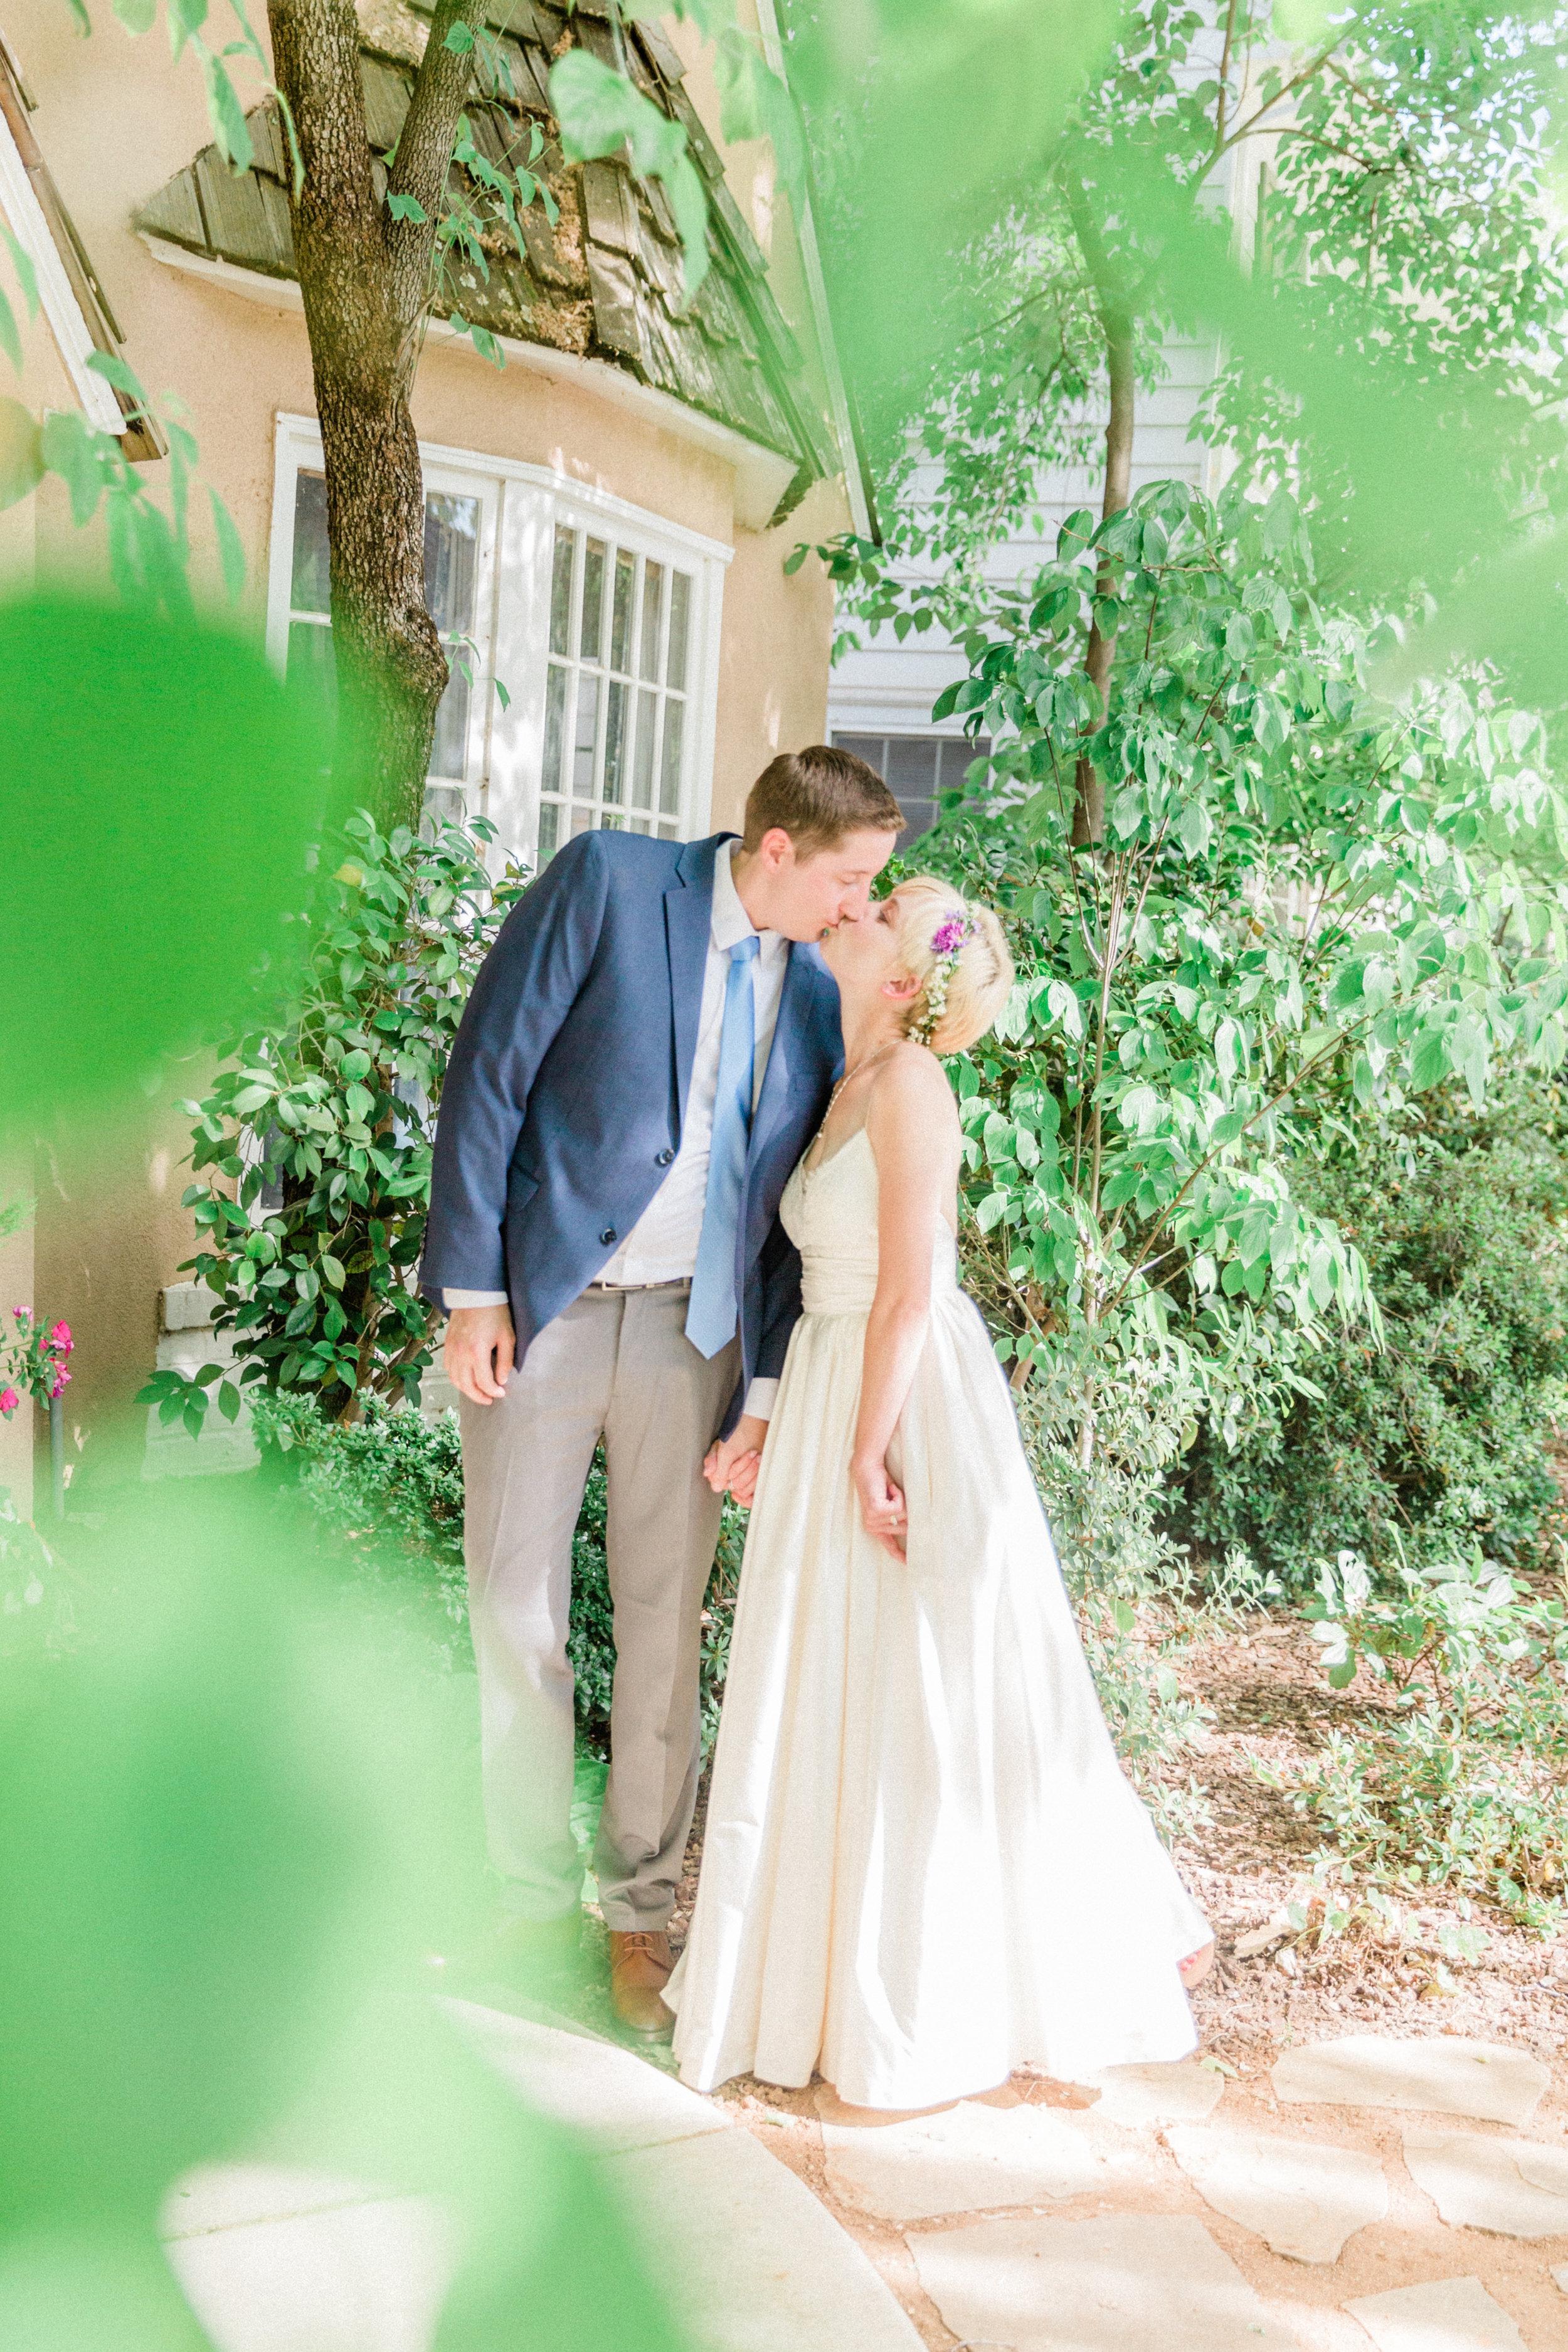 Sarah and John - Married - Lauren Alisse Photography-49.jpg